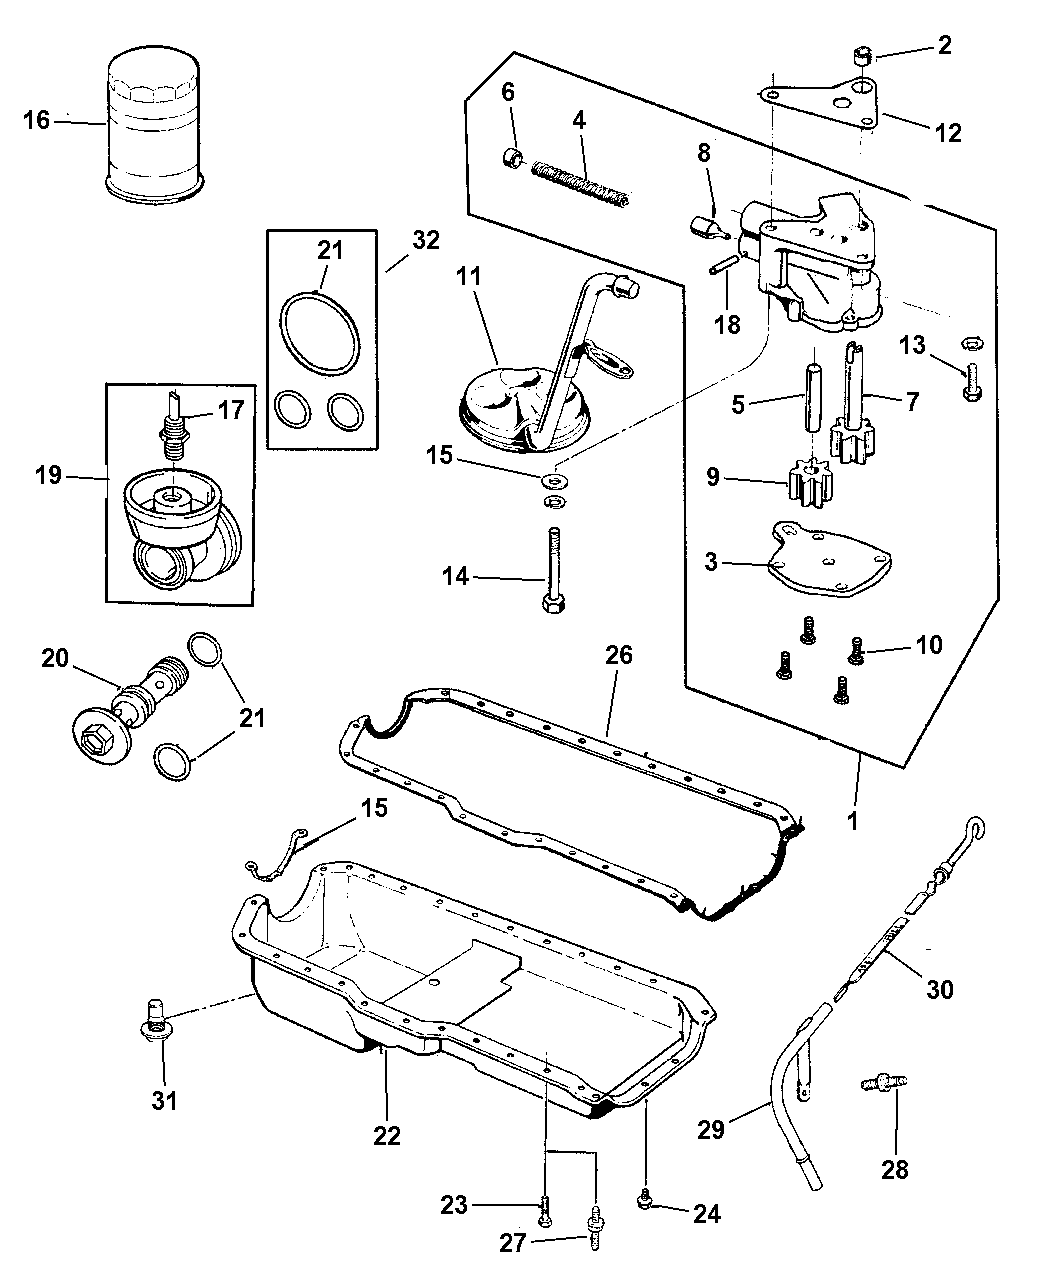 Tech Teazer: 2000 Jeep Grand Cherokee Oil Pan